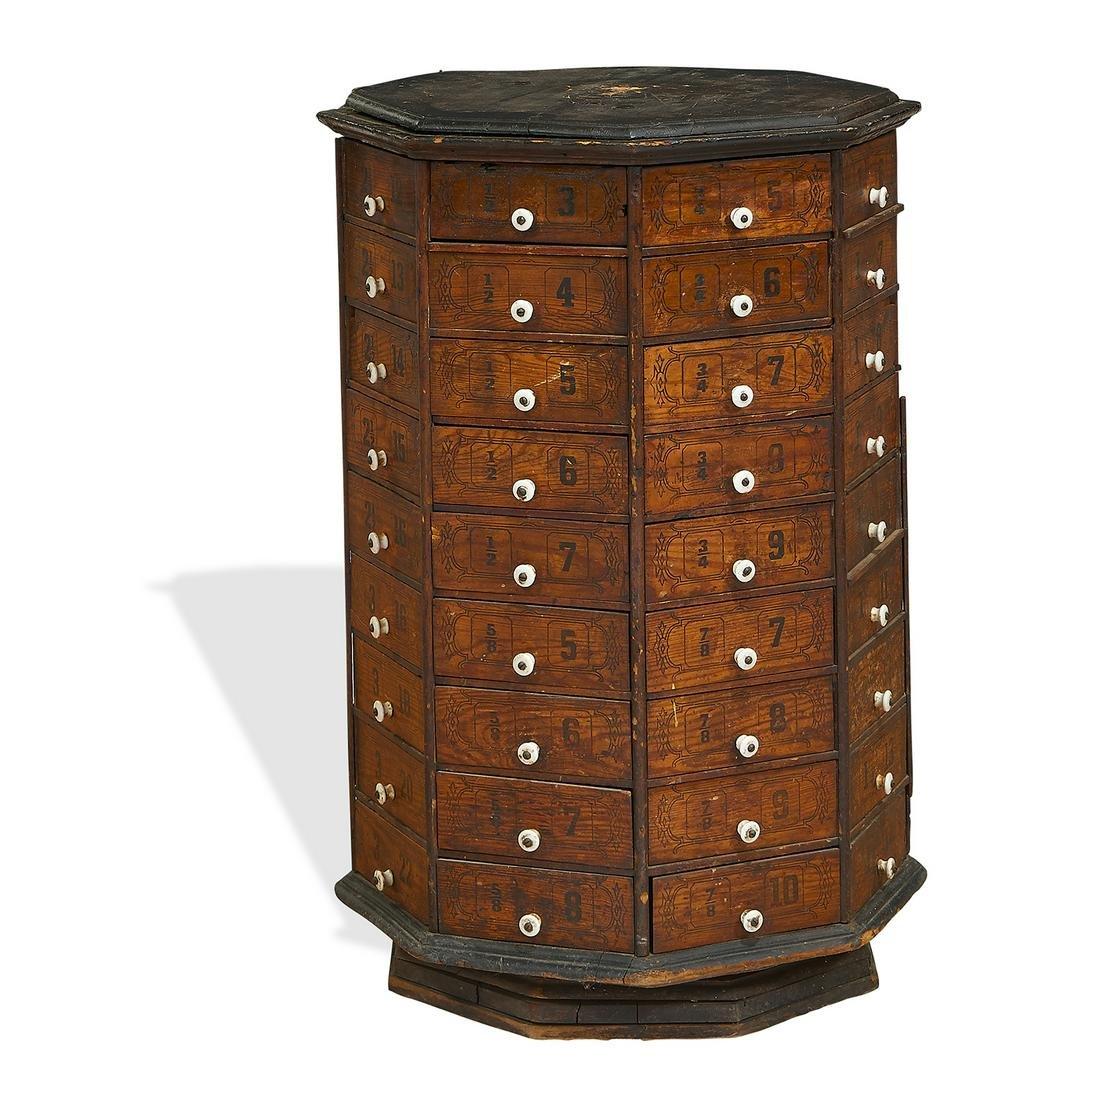 American Antique 72-drawer revolving cabinet